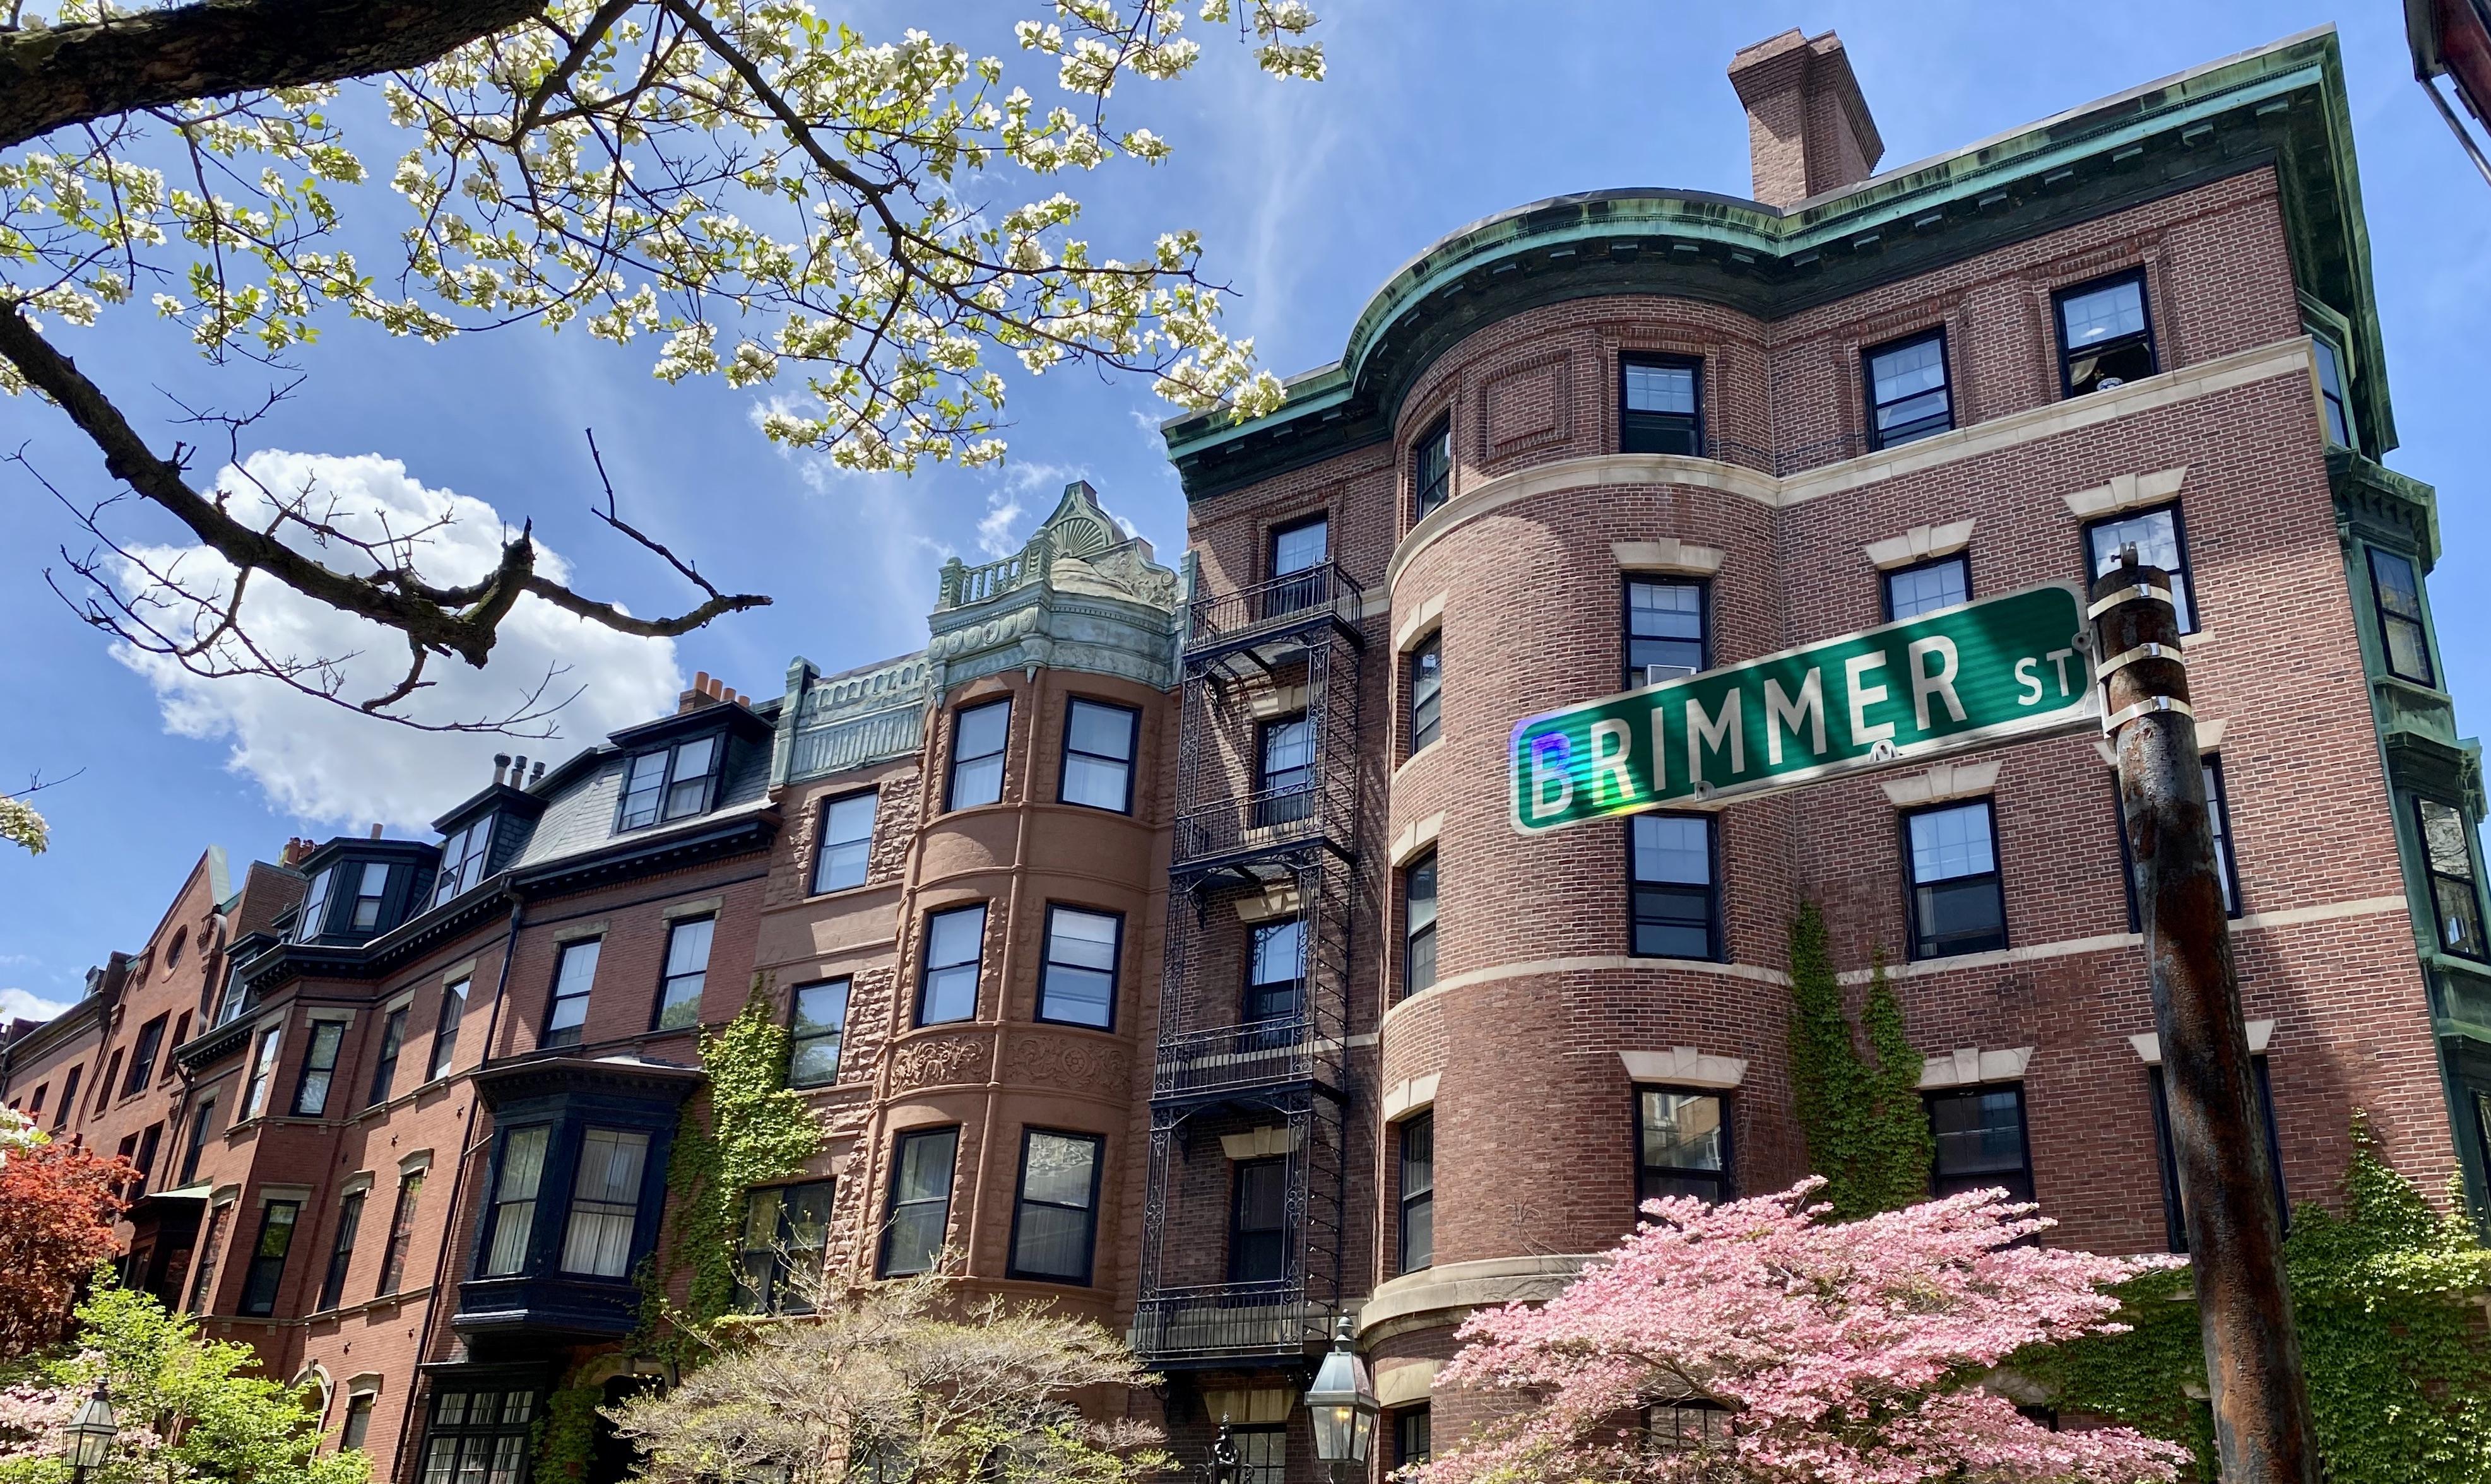 Brimmer Street Brownstones in Boston, MA